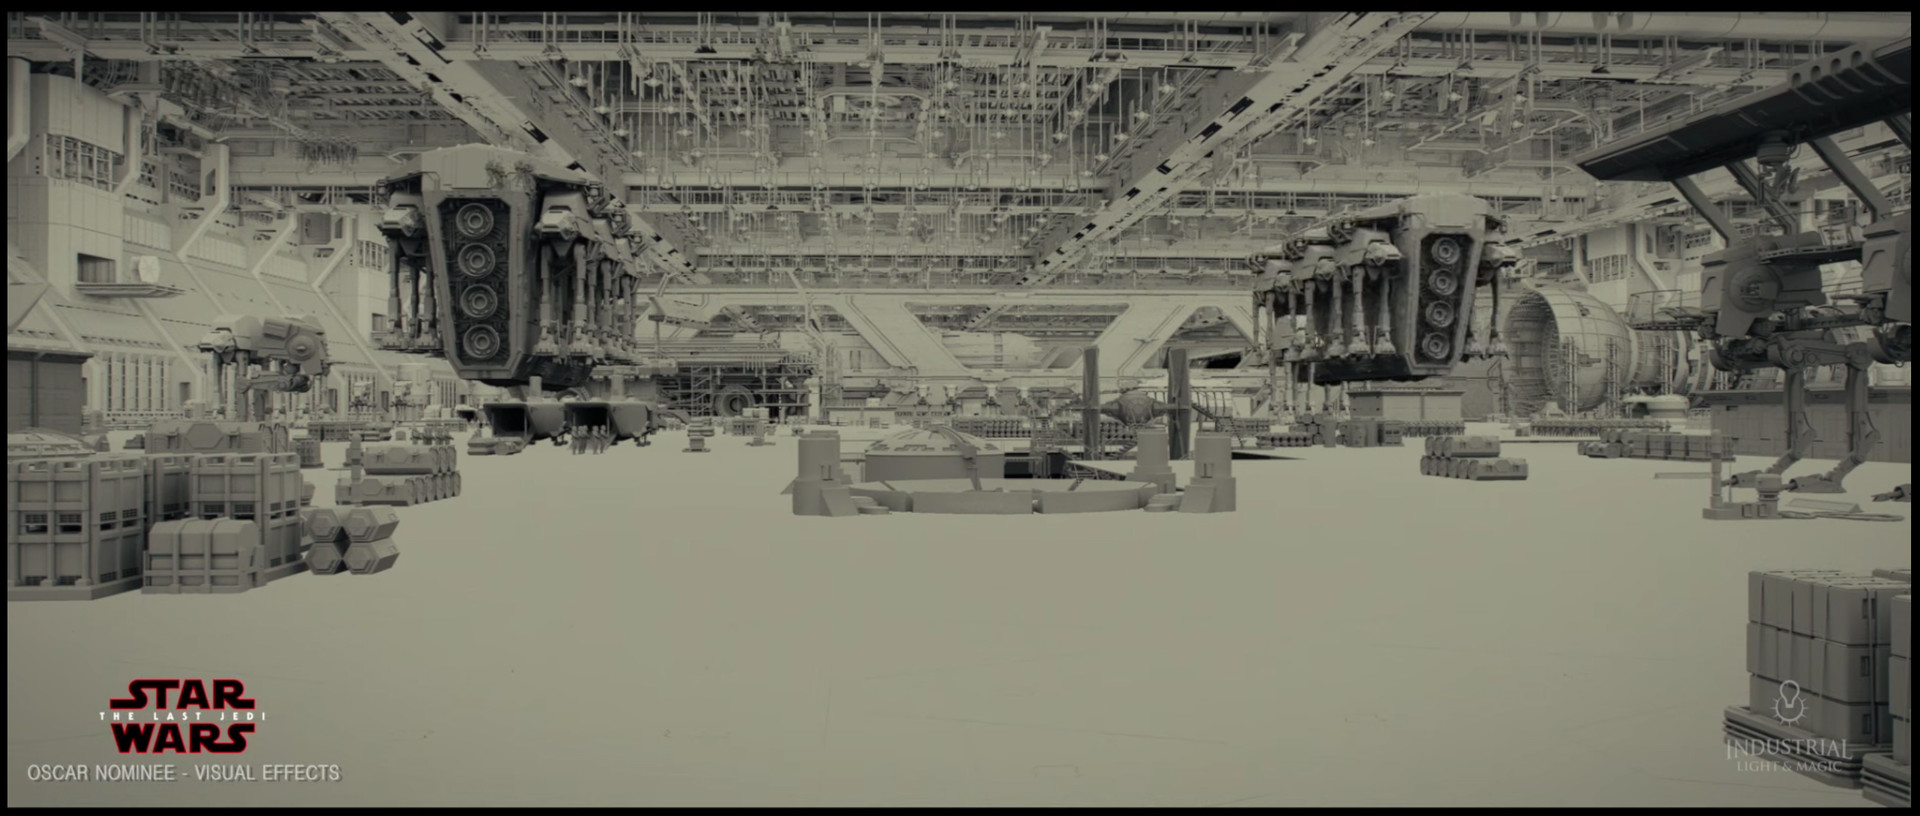 Andrew hodgson hangar06